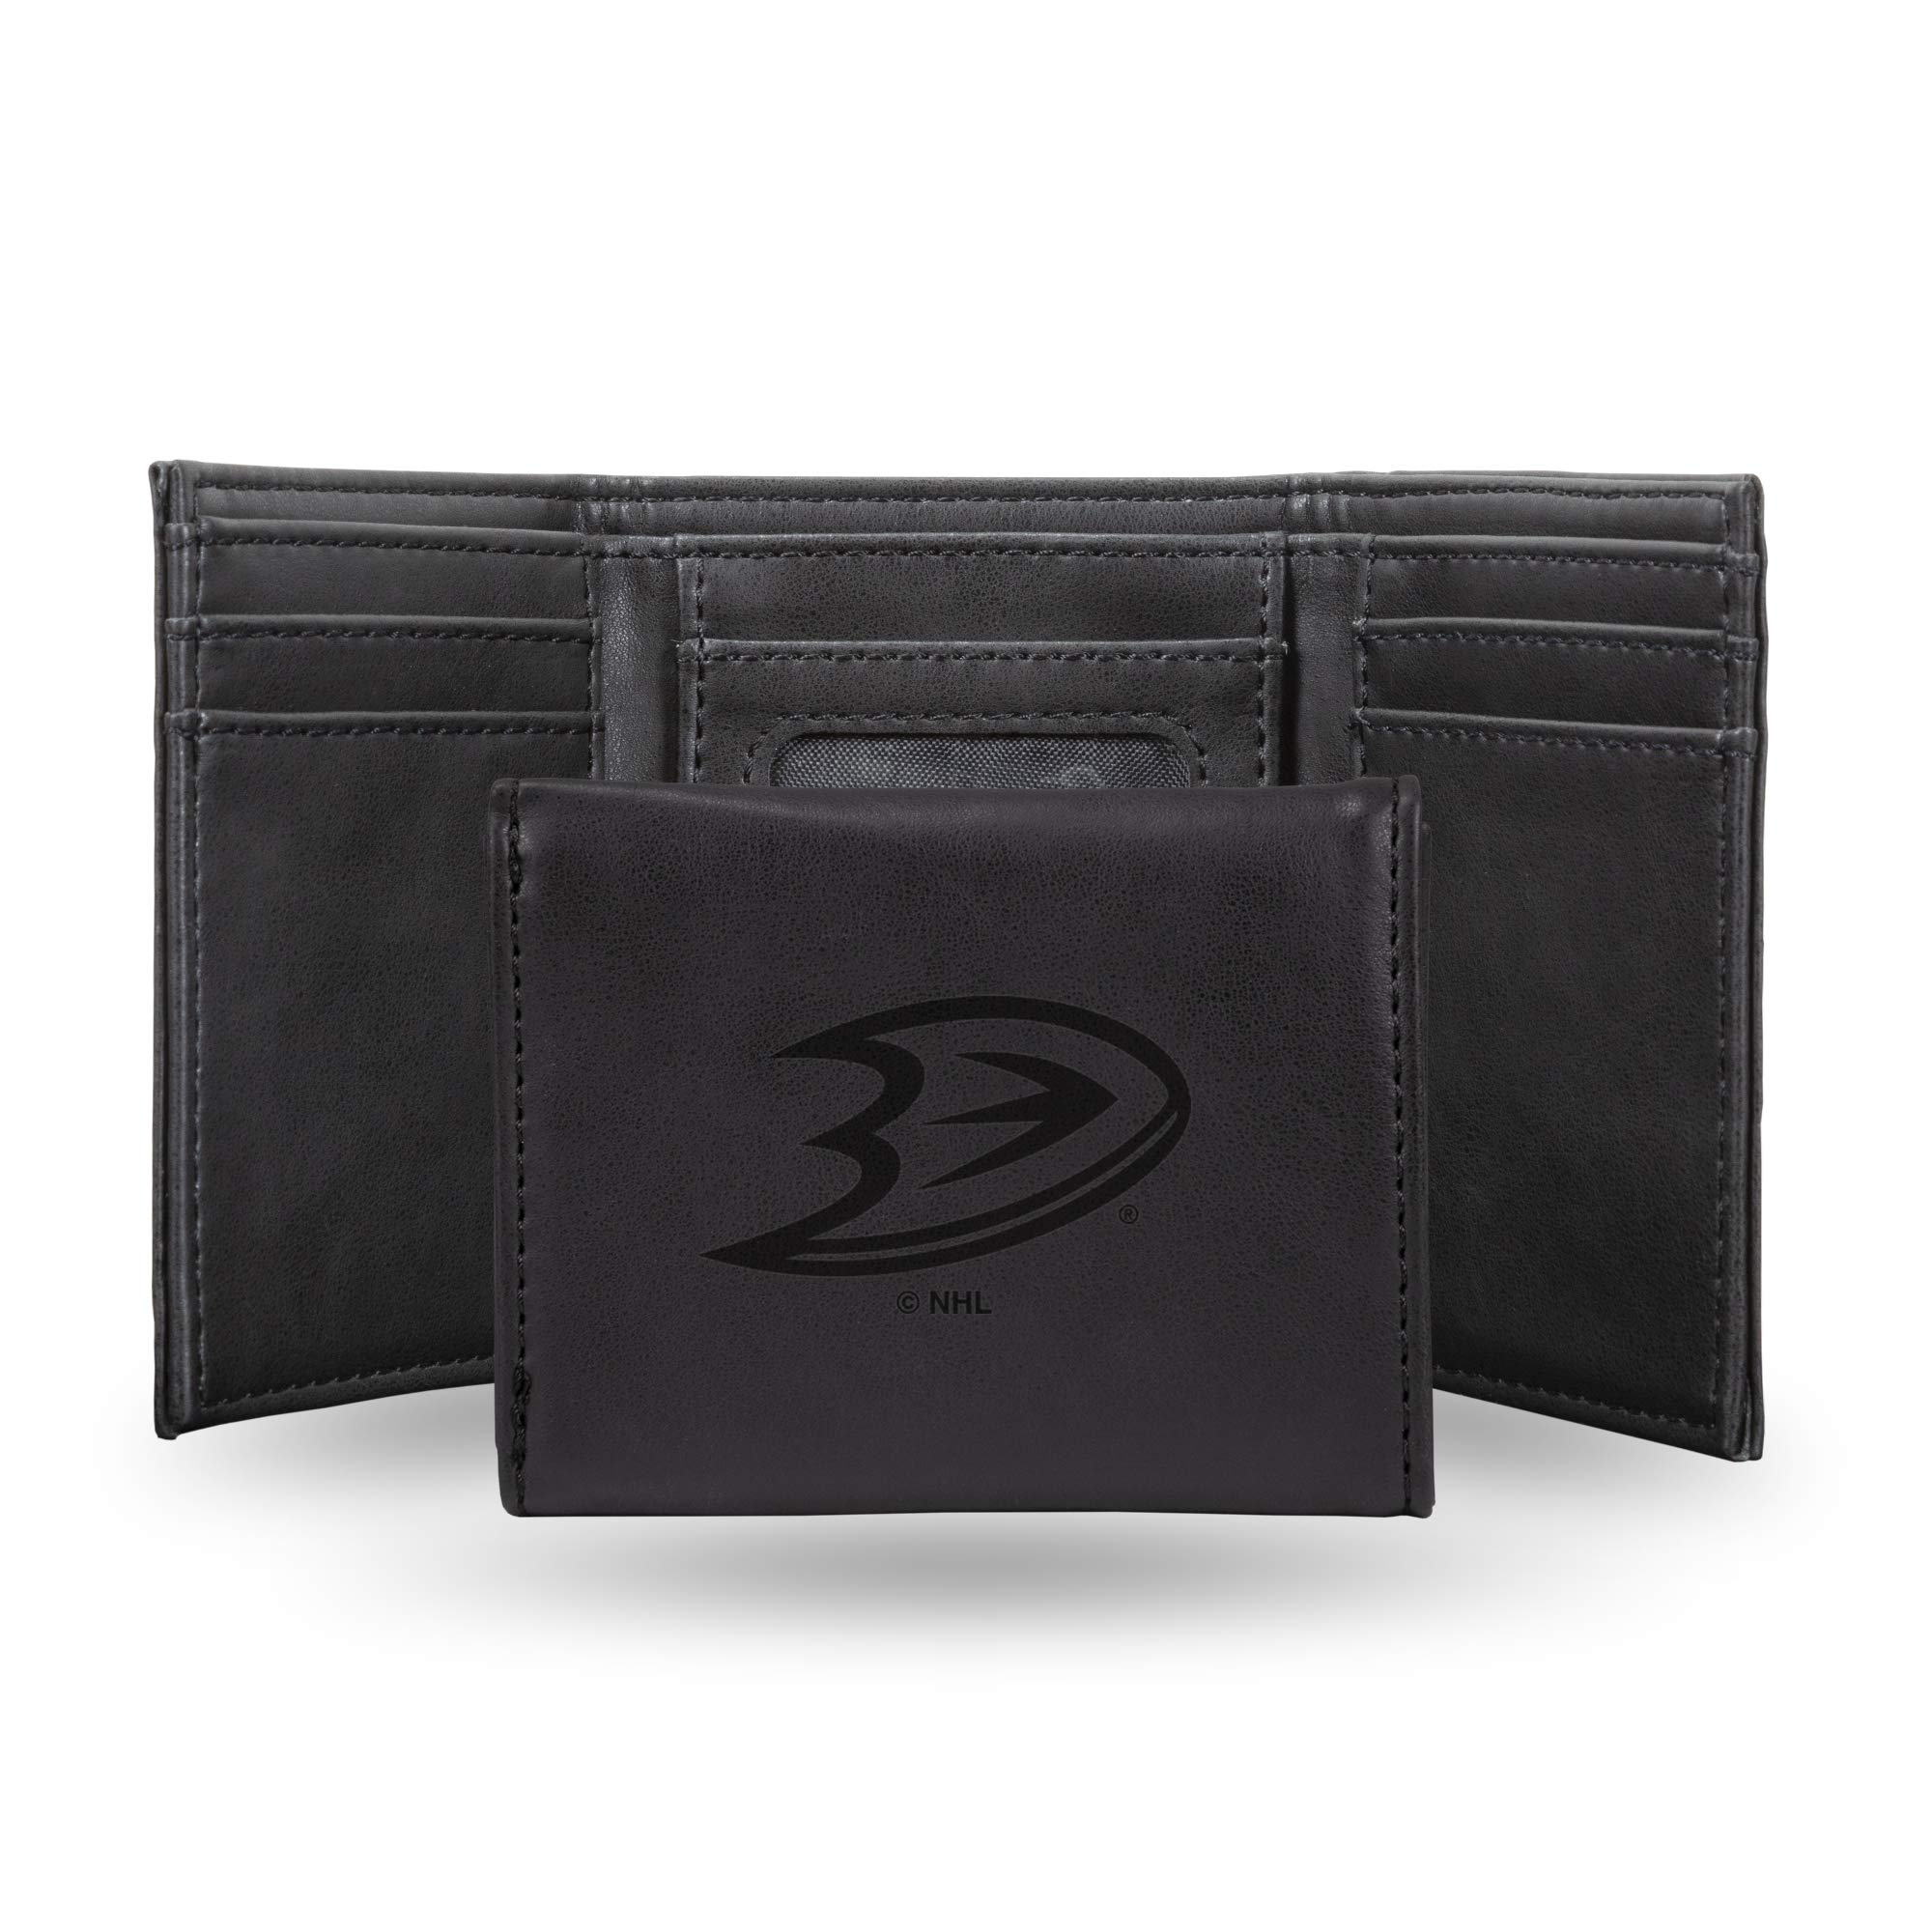 NHL Rico Industries  Laser Engraved Trifold Wallet, Anaheim Ducks